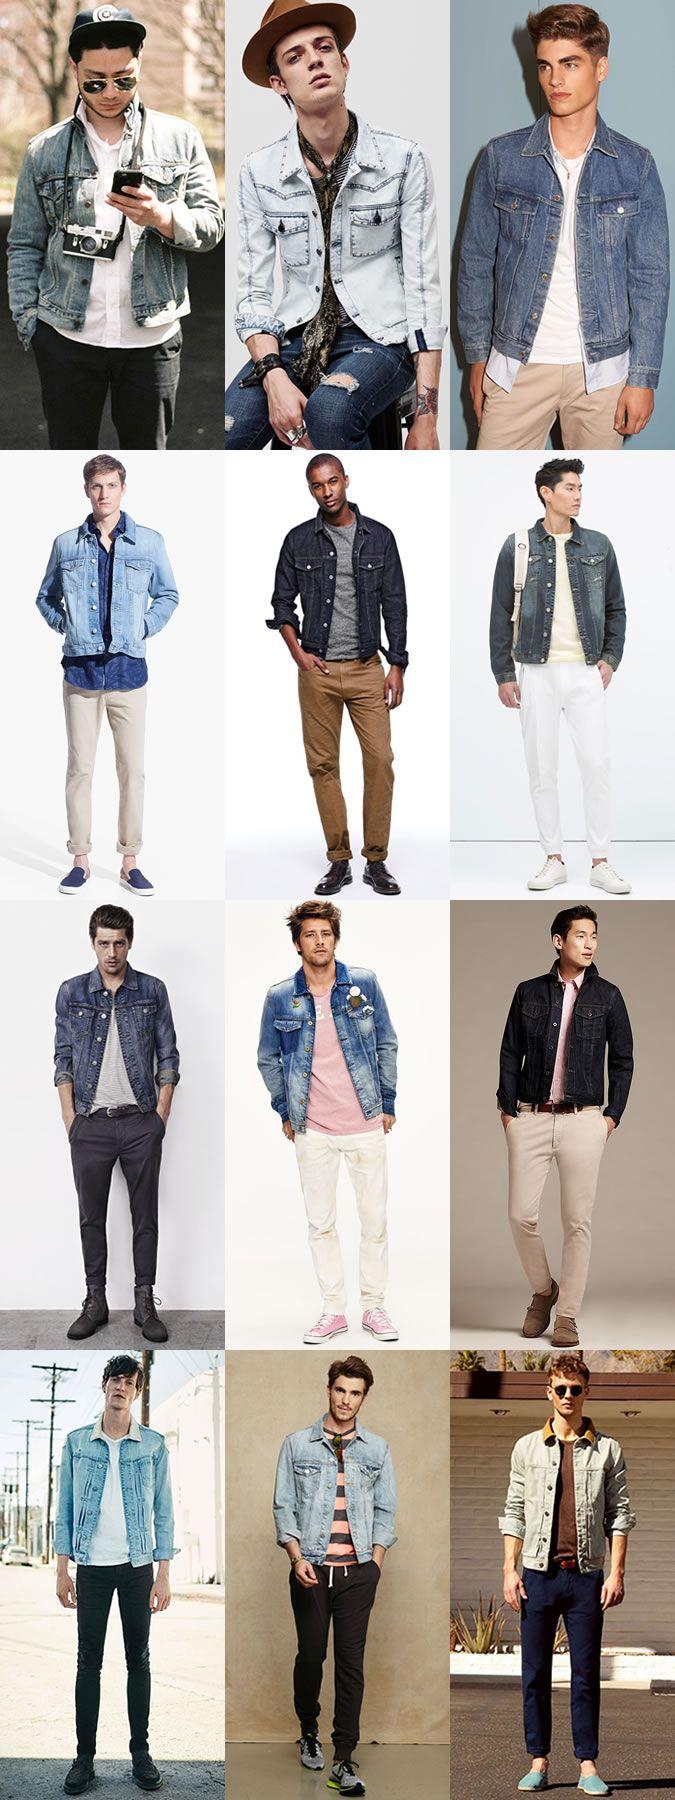 The Easy Ways To Wear Denim This Season: The Denim Jacket Lookbook Inspiration